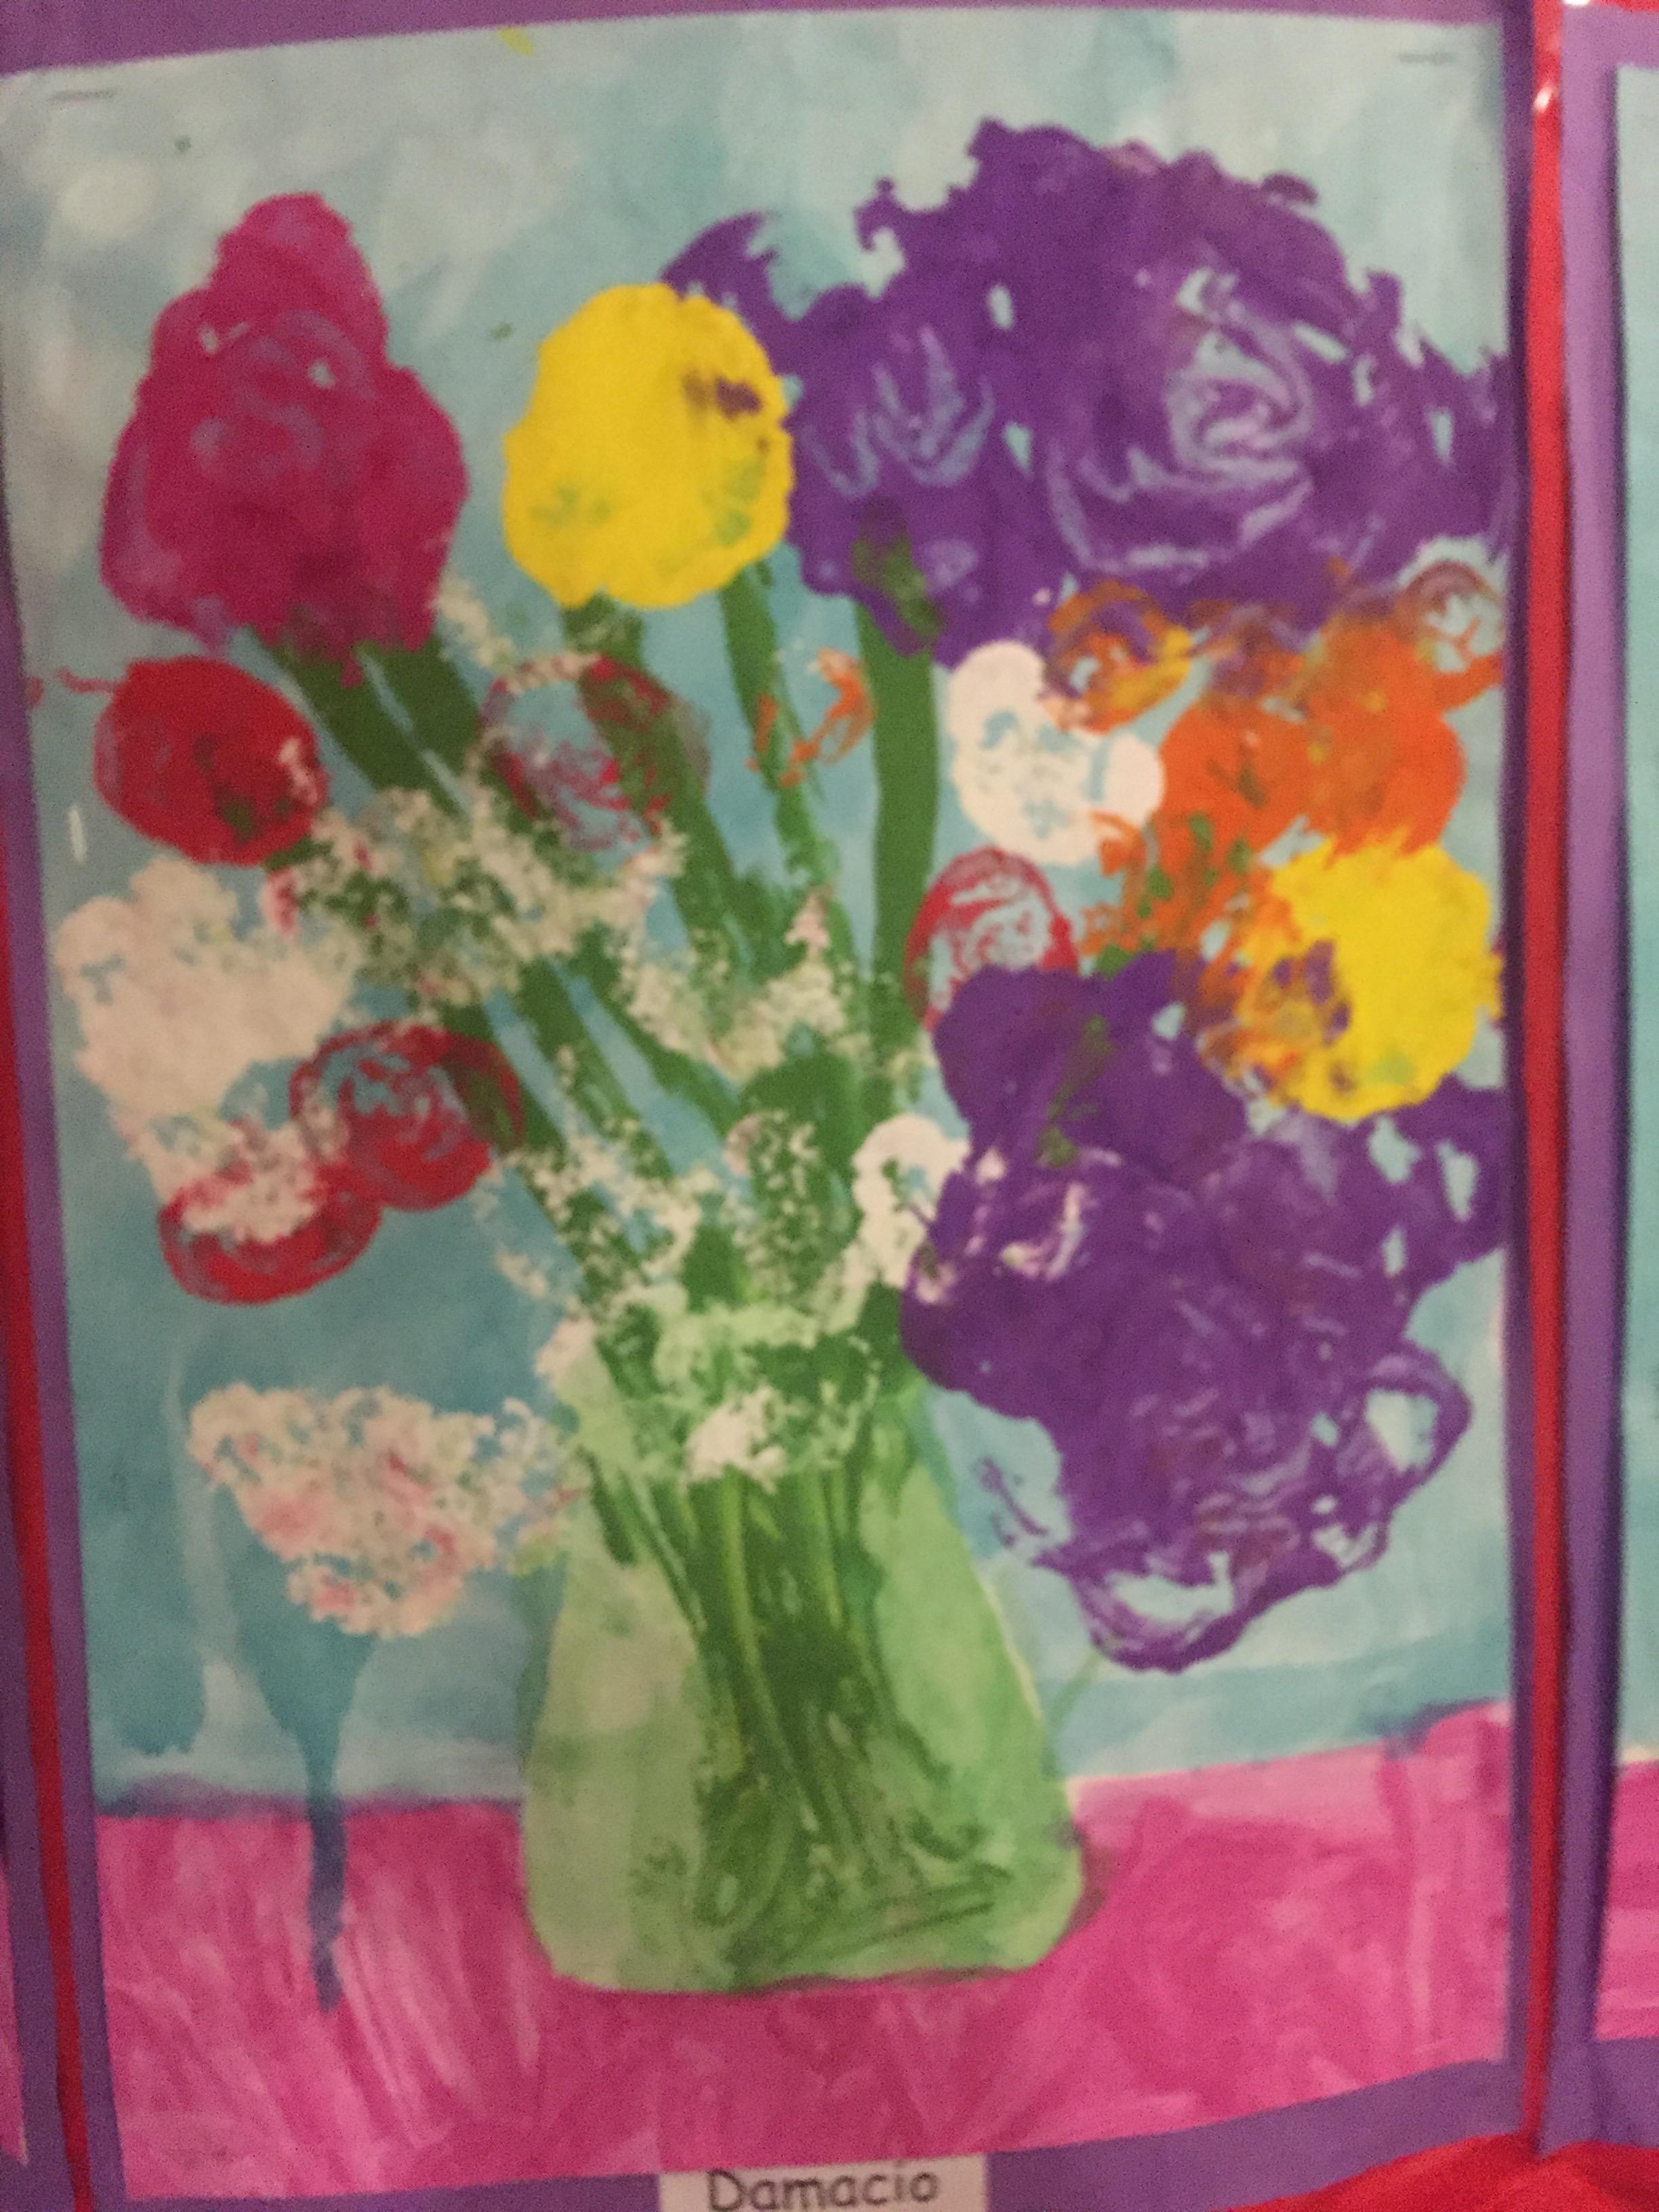 April Showers Bring Spring Flowers!